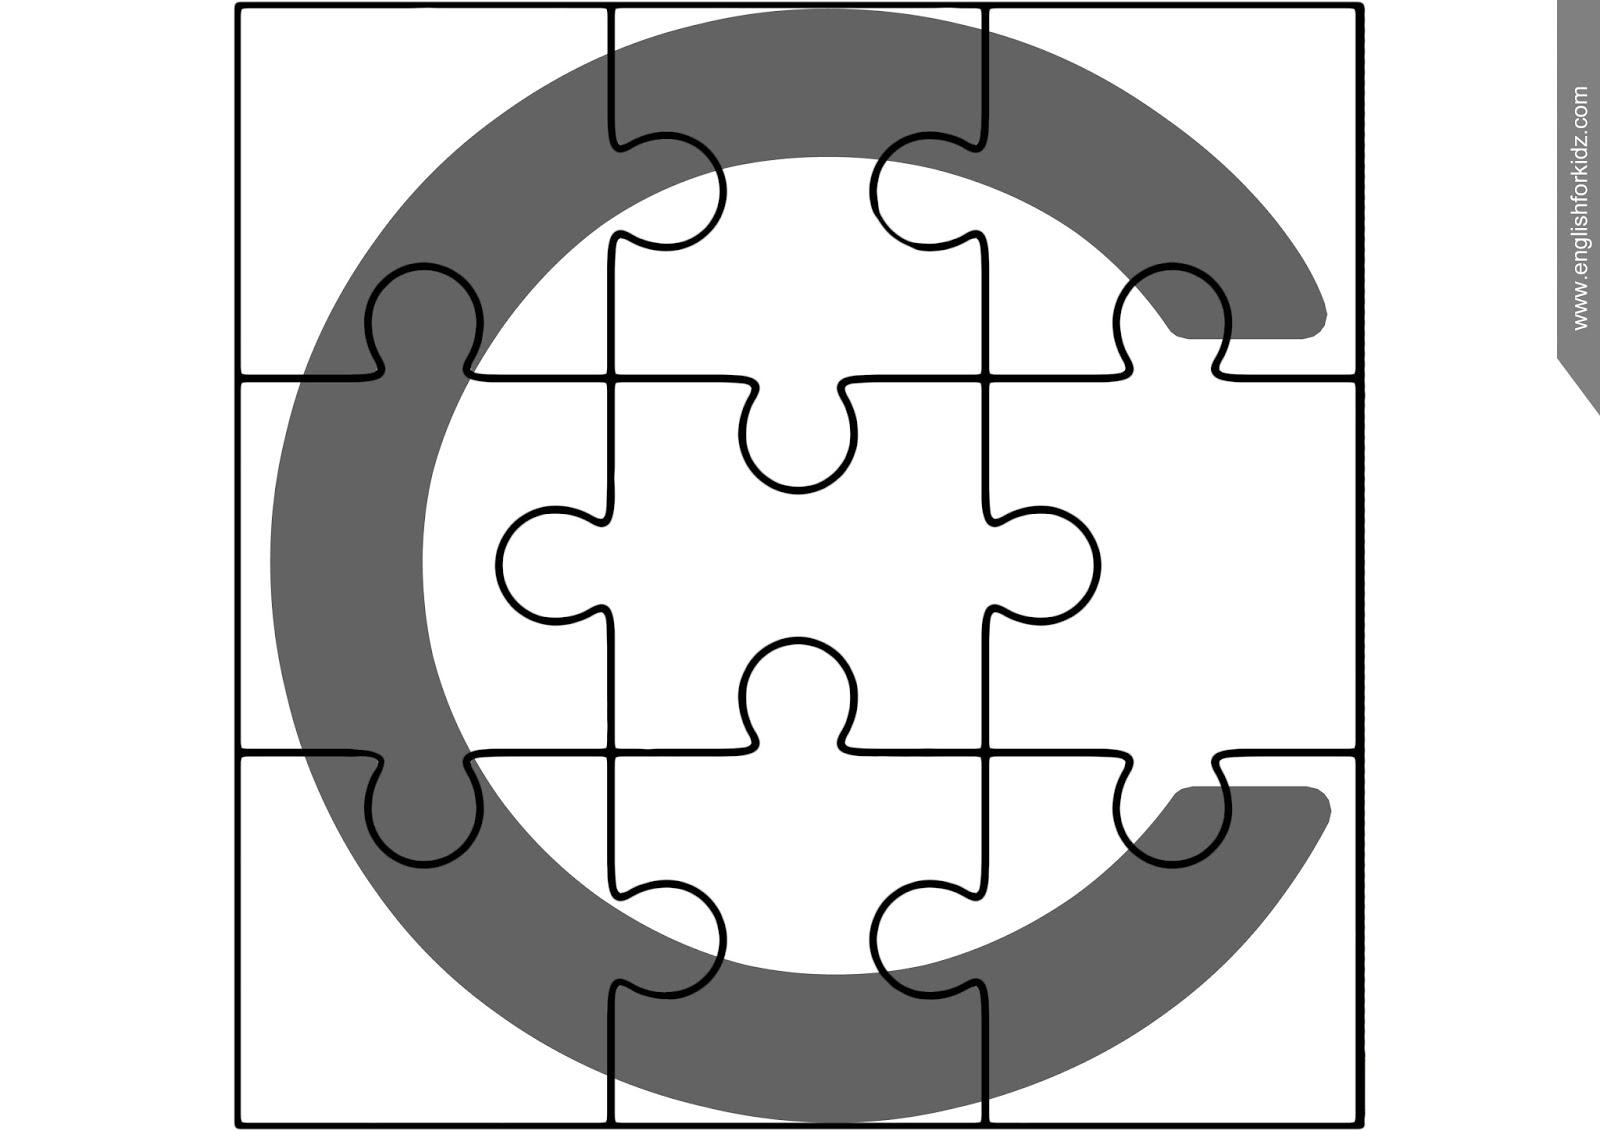 english-alphabet-puzzle-letter-c-upperca